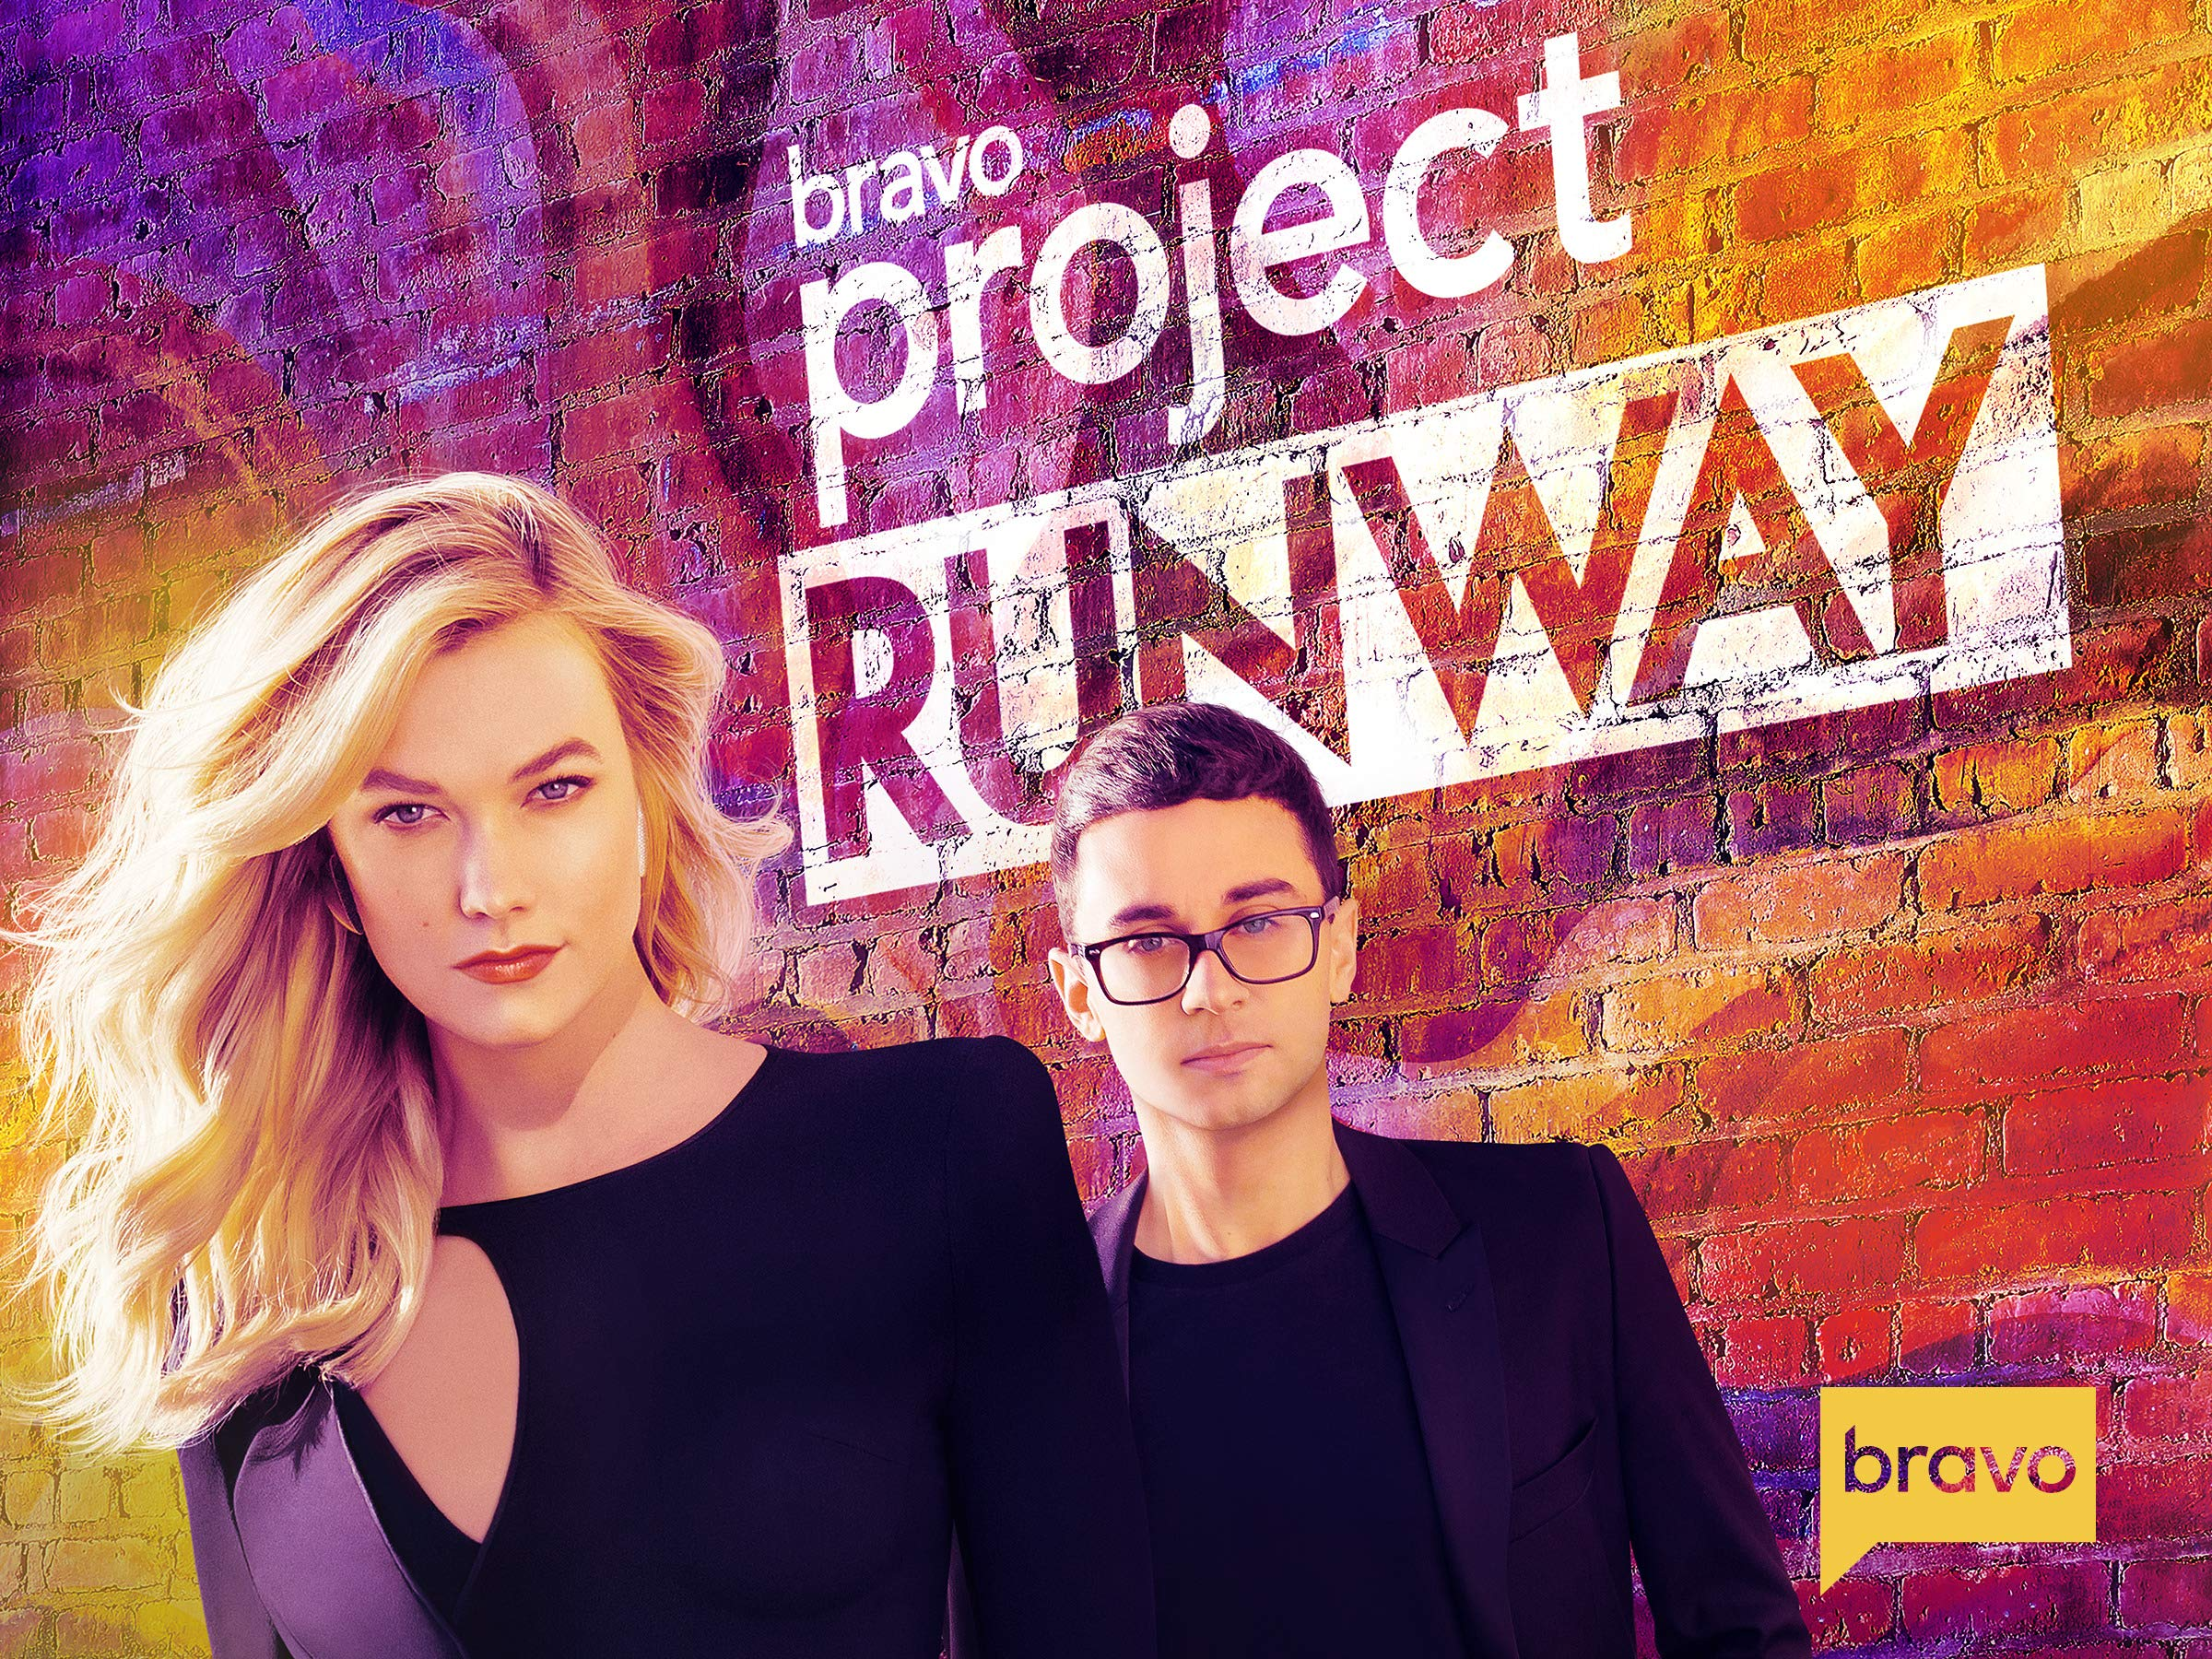 Project Runway Season 19 update